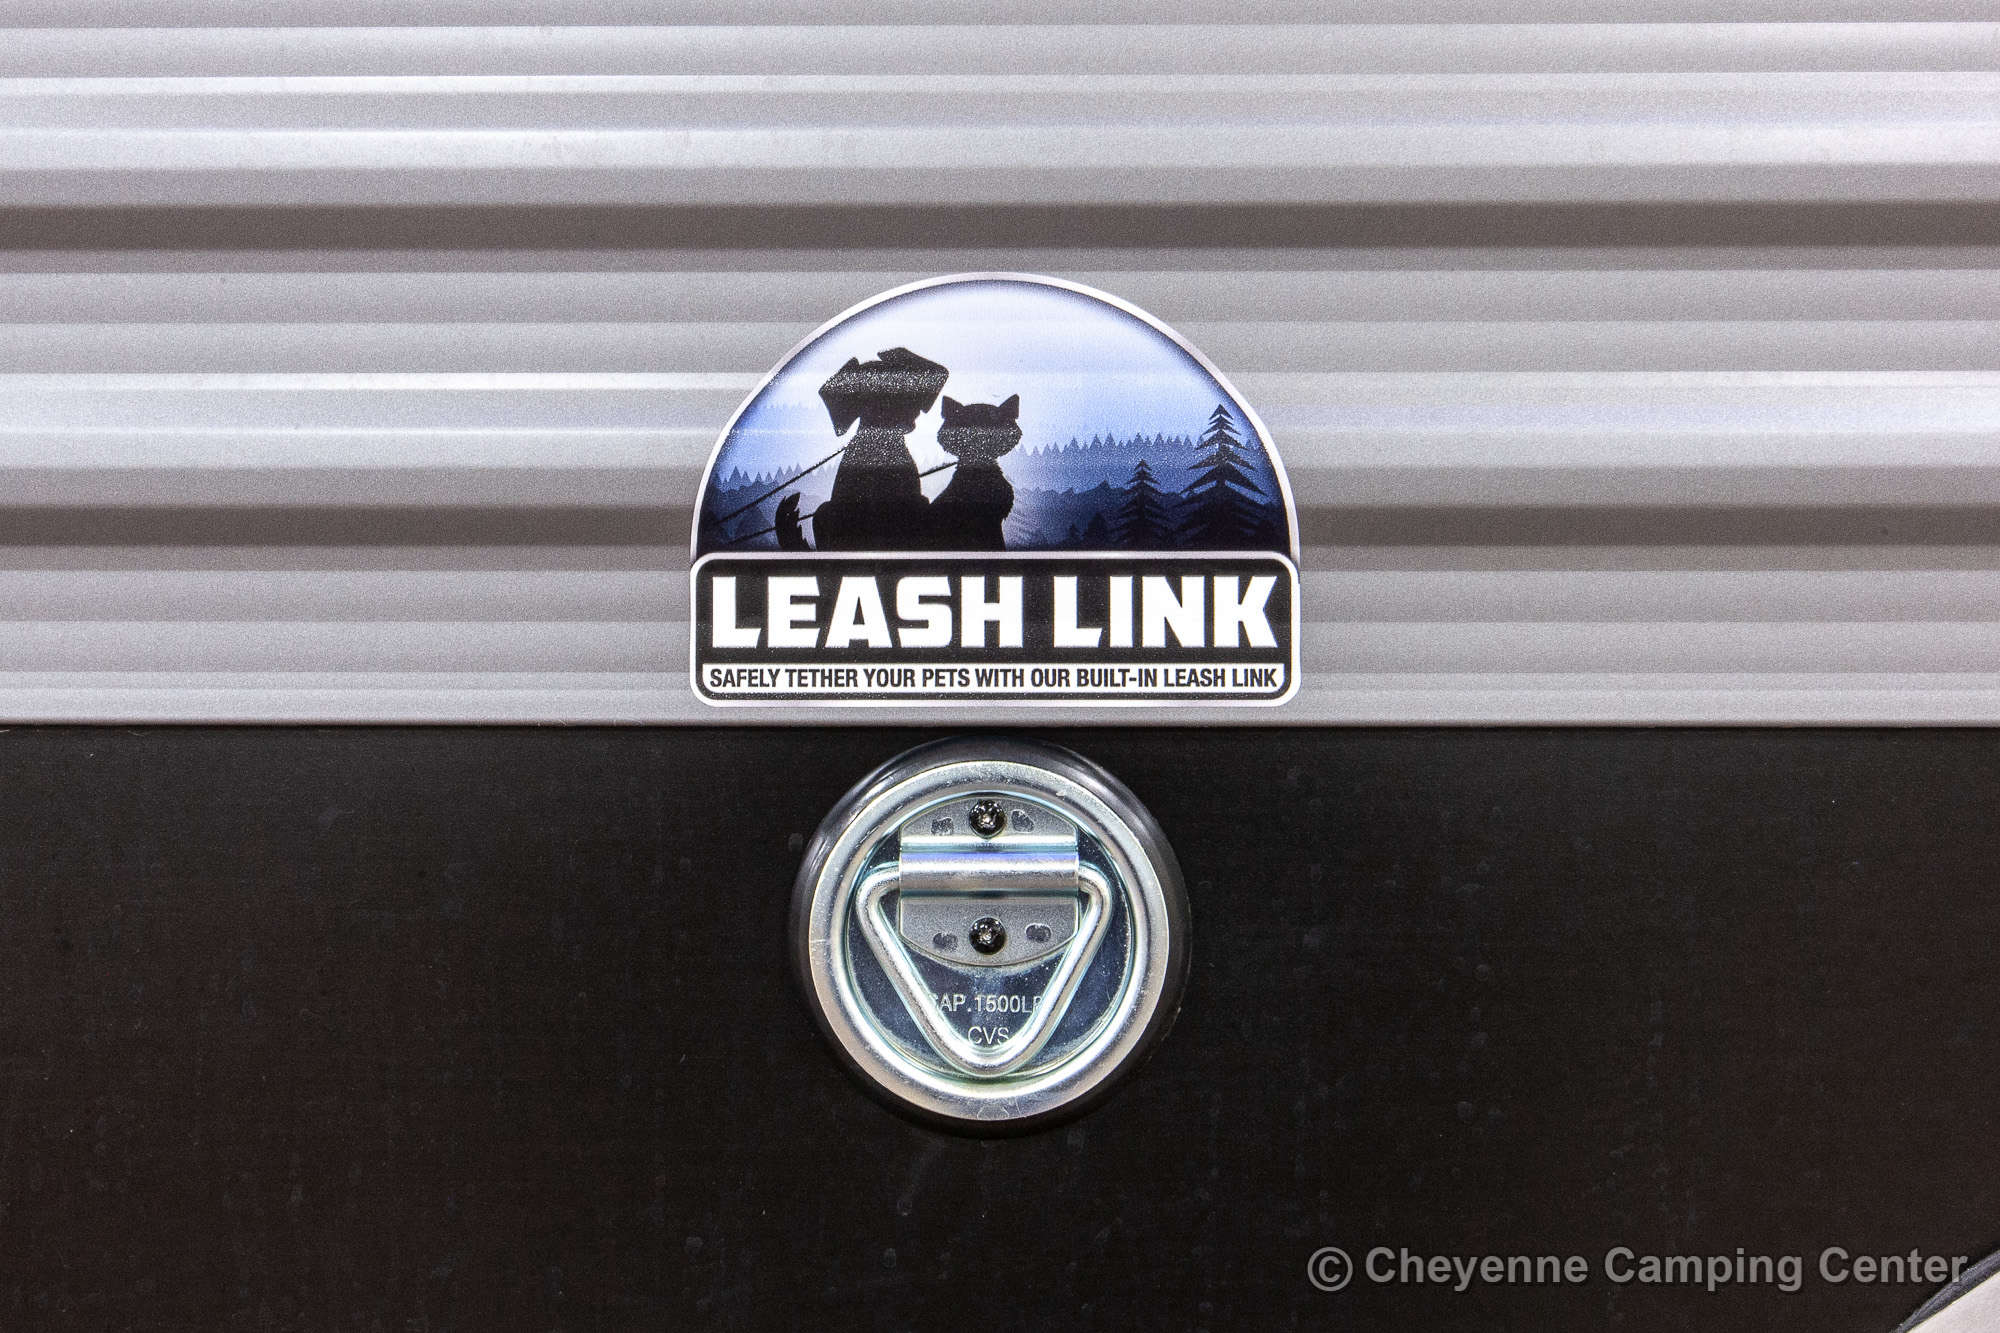 2021 Coachmen Catalina Legacy Edition 293QBCK Bunkhouse Travel Trailer Exterior Image